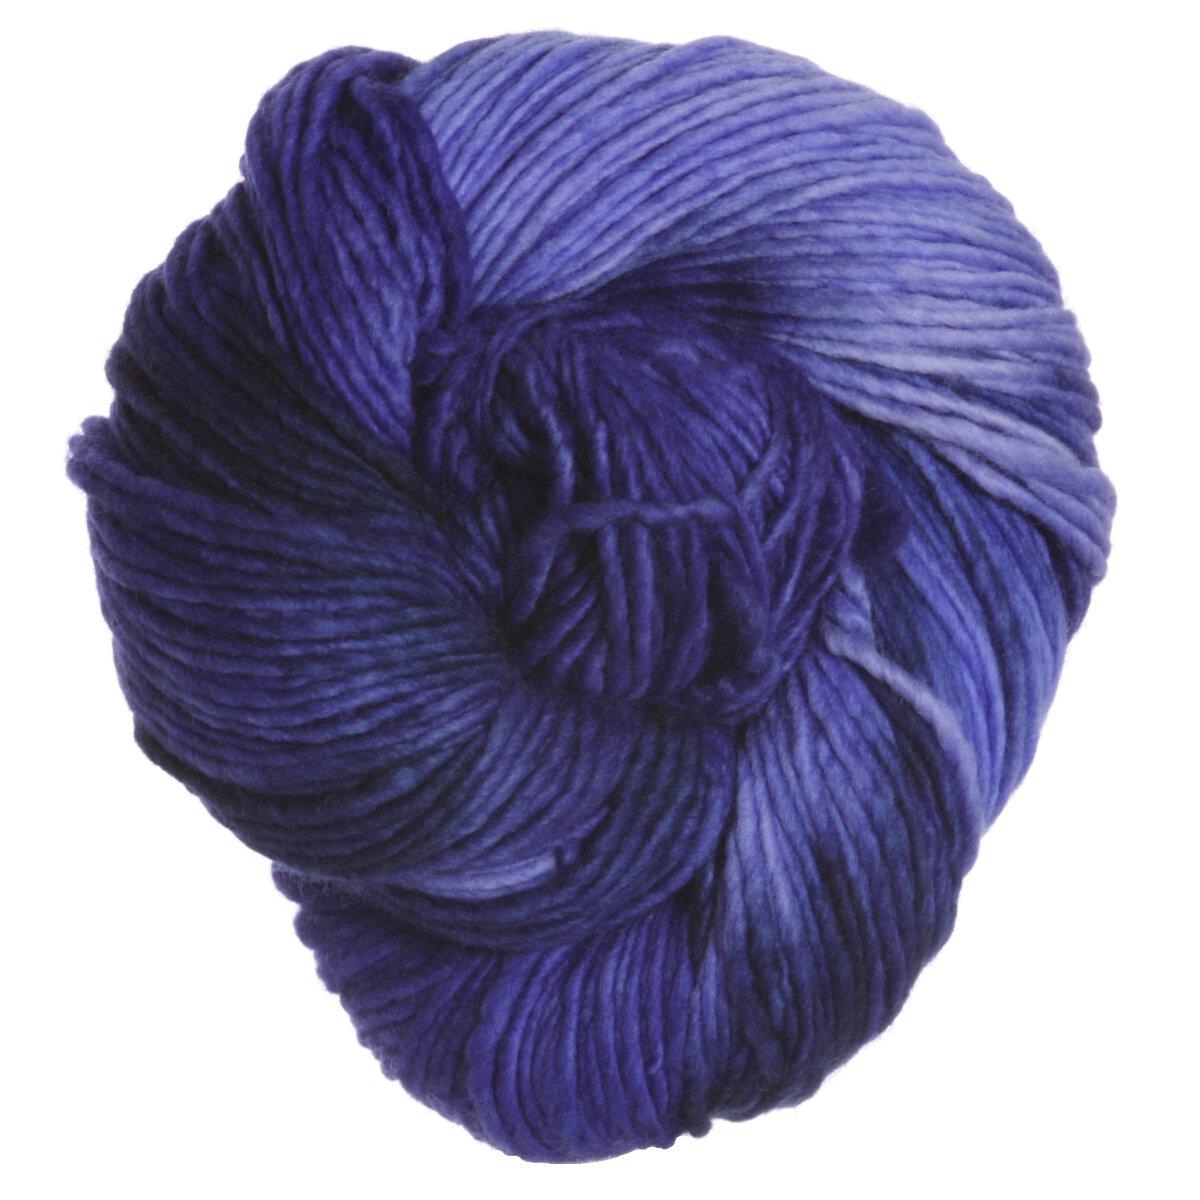 Malabrigo Worsted Merino Yarn Reviews at Jimmy Beans Wool